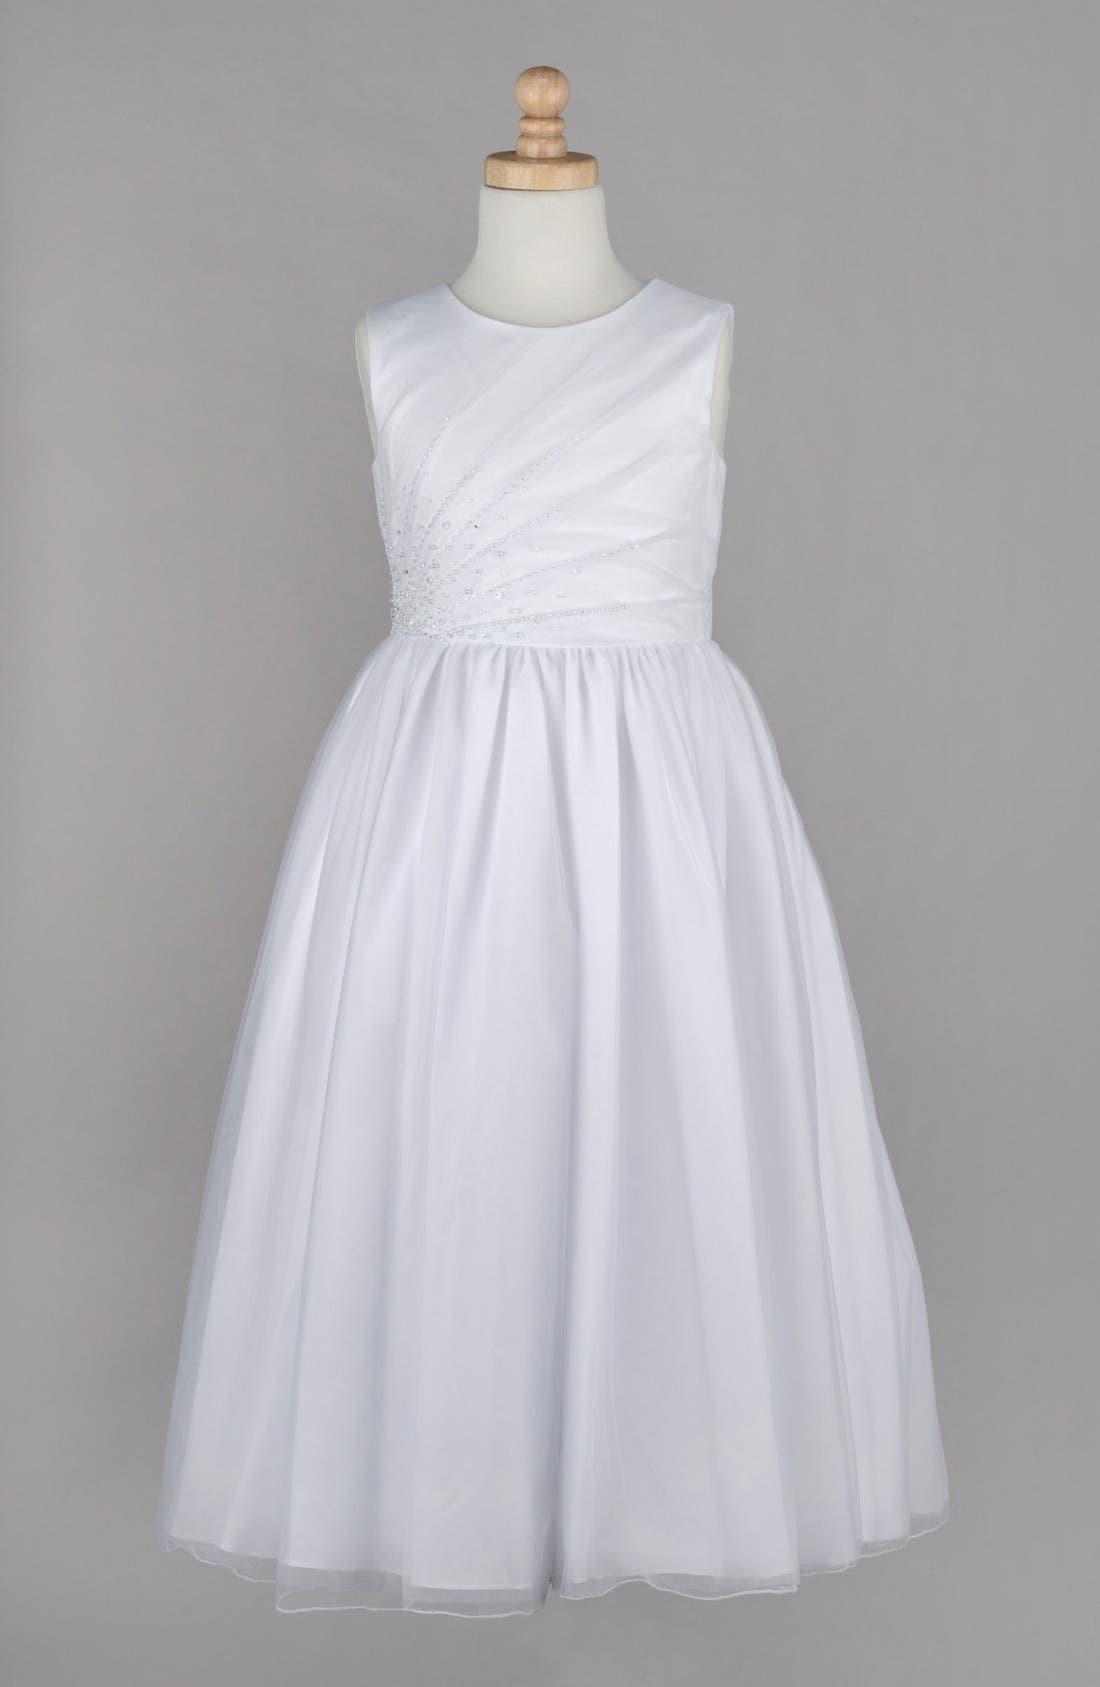 Alternate Image 1 Selected - Lauren Marie Beaded First Communion Dress (Little Girls & Big Girls)